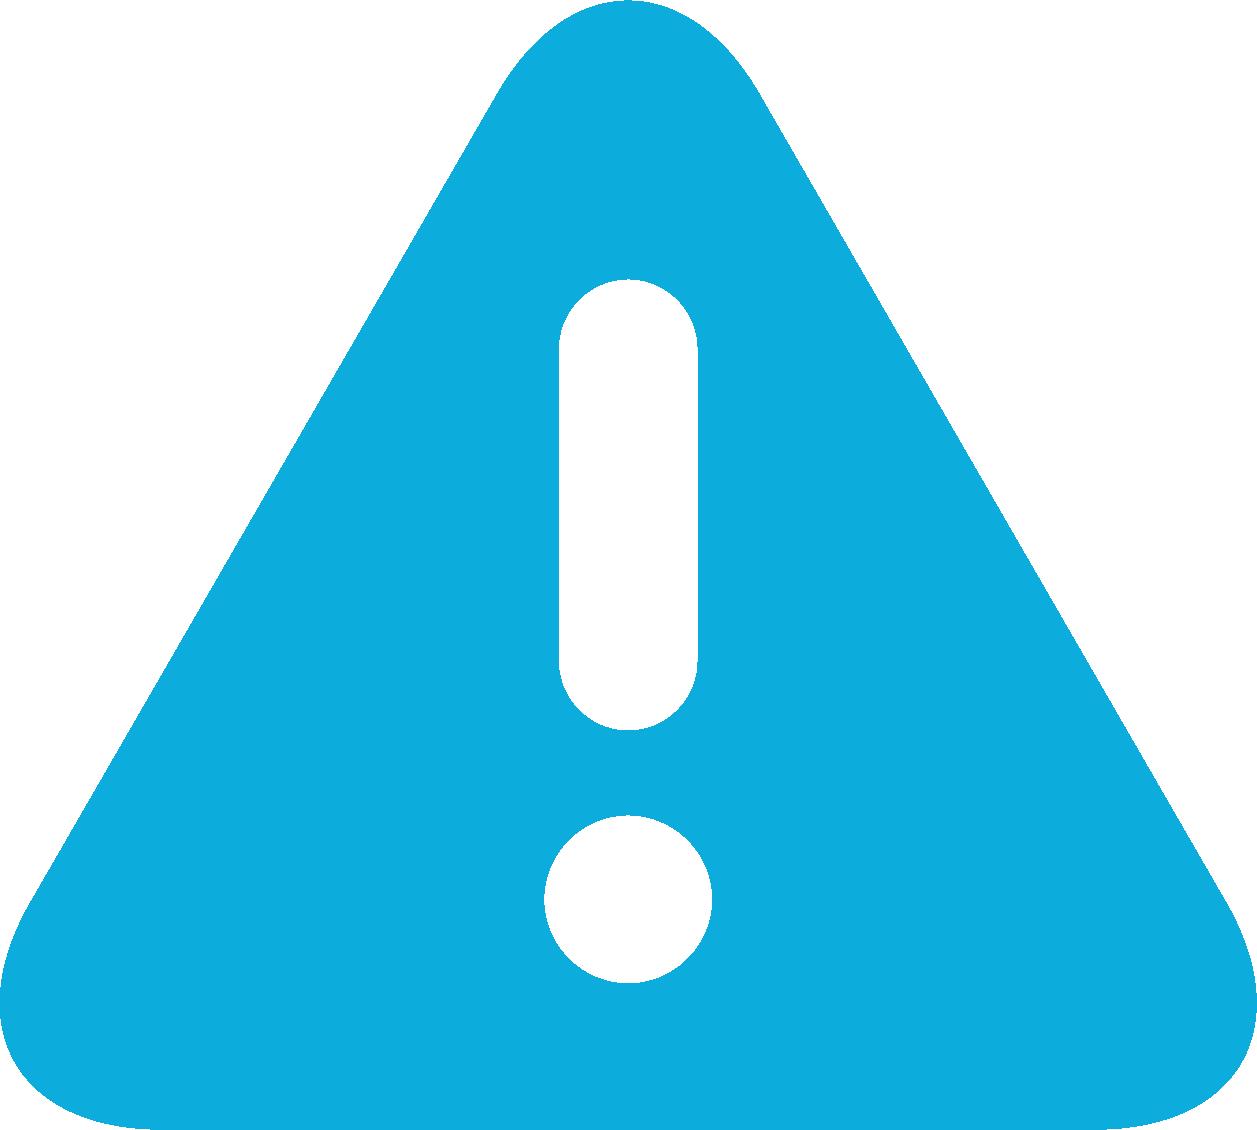 IT monitoring alert icon